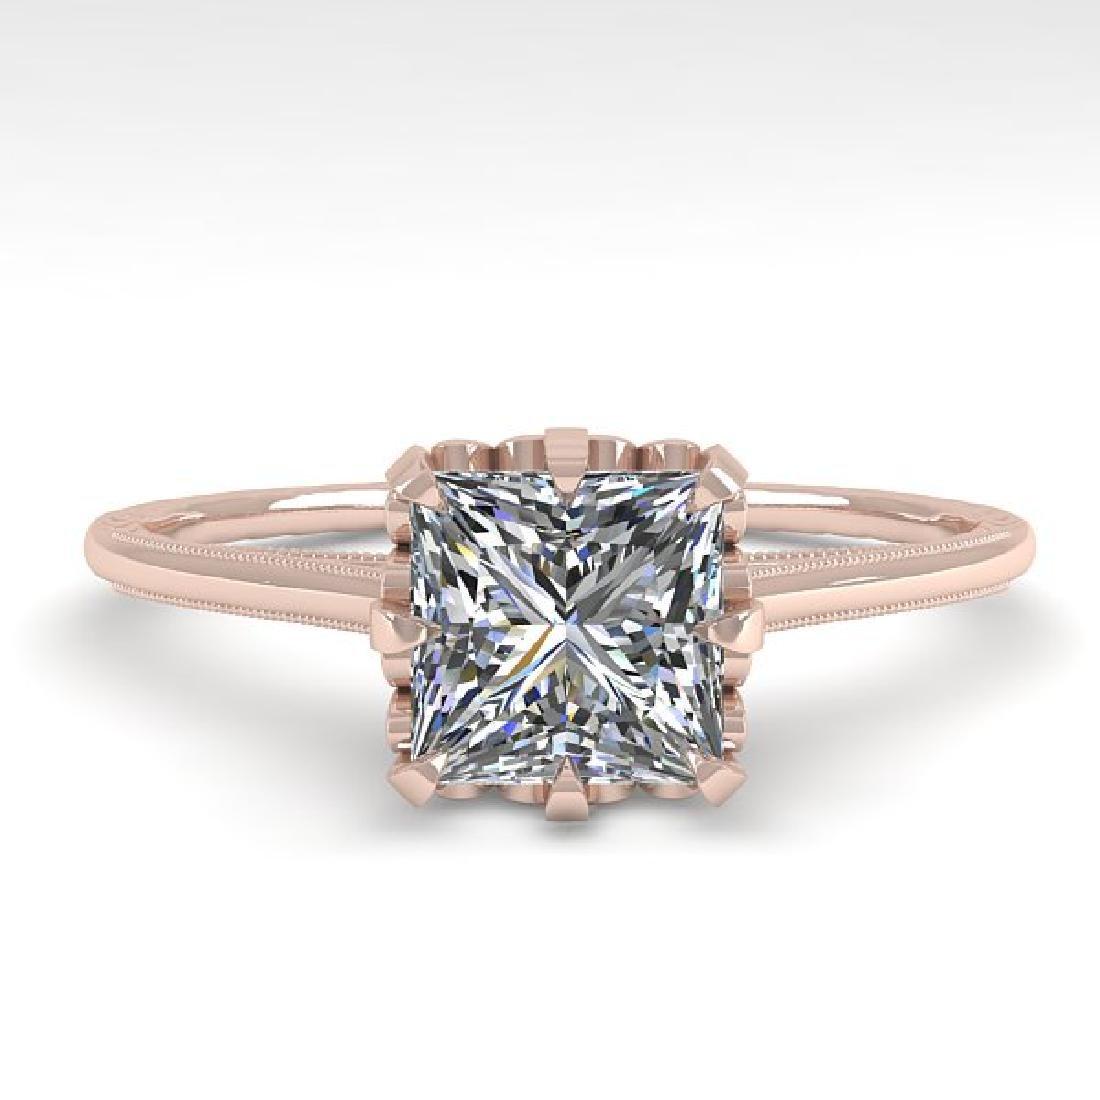 1.0 CTW VS/SI Princess Diamond Solitaire Ring 14K Rose